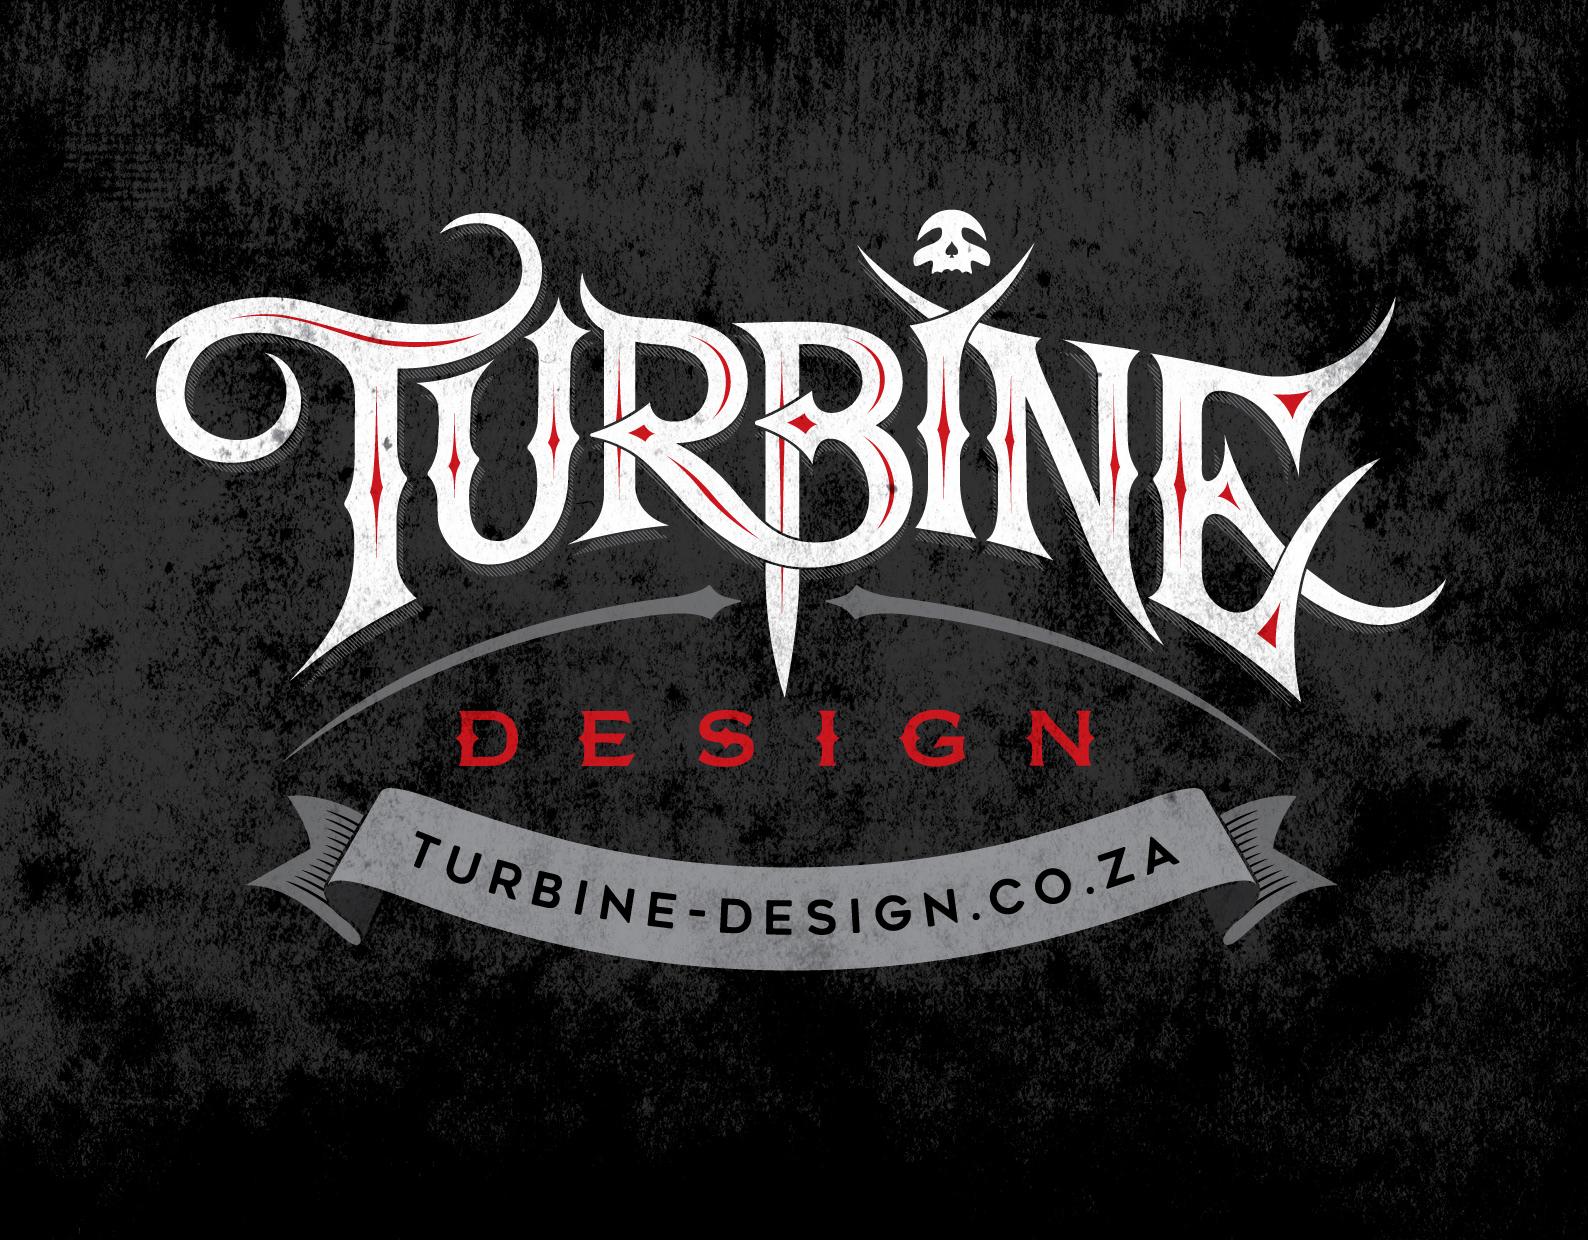 TURBINE-DESIGN 2e306692c7f